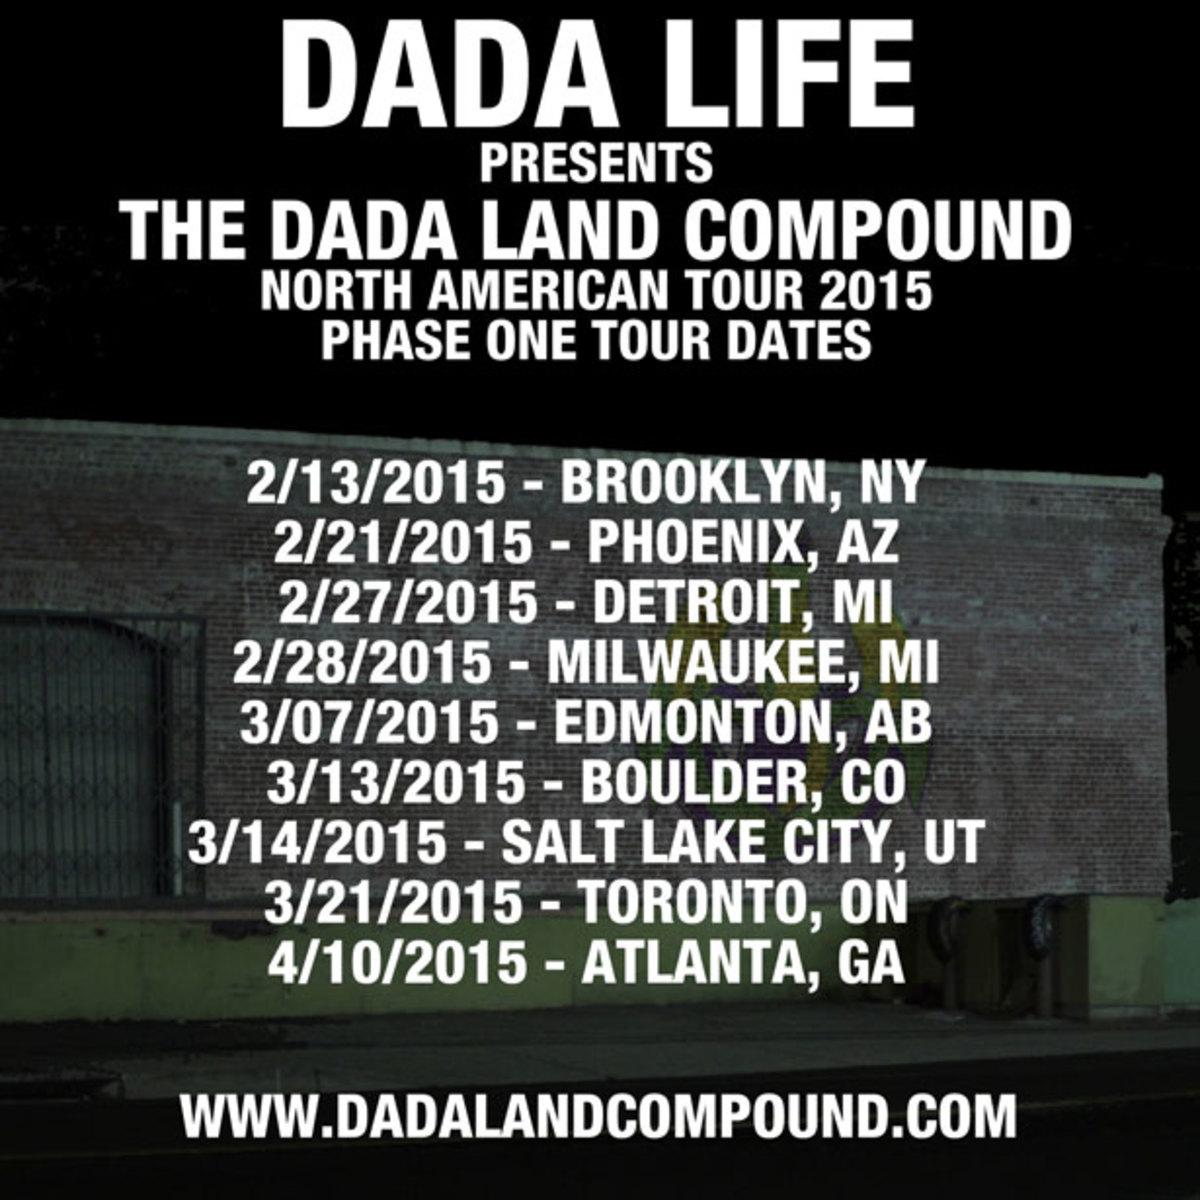 Dada Life Announces 2015 Dada Land Compound Parties